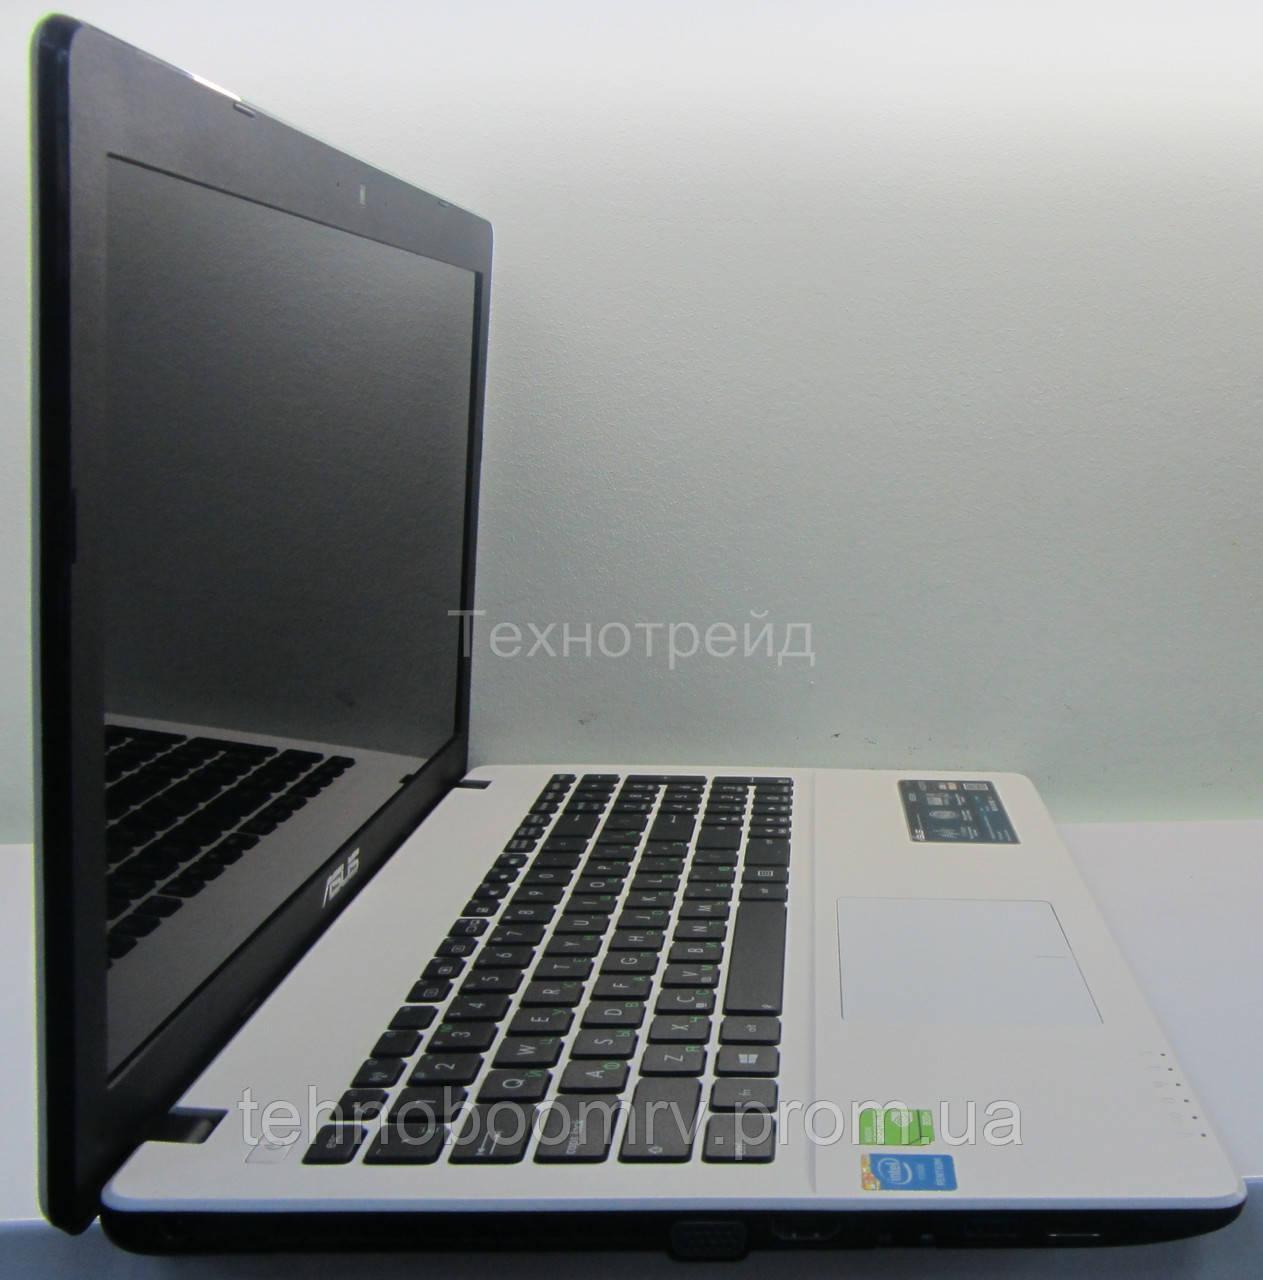 Asus X552M - 4ядра Intel Pentium N3540 2.66GHz/DDR3 4GB/GT 810M 1GB 2